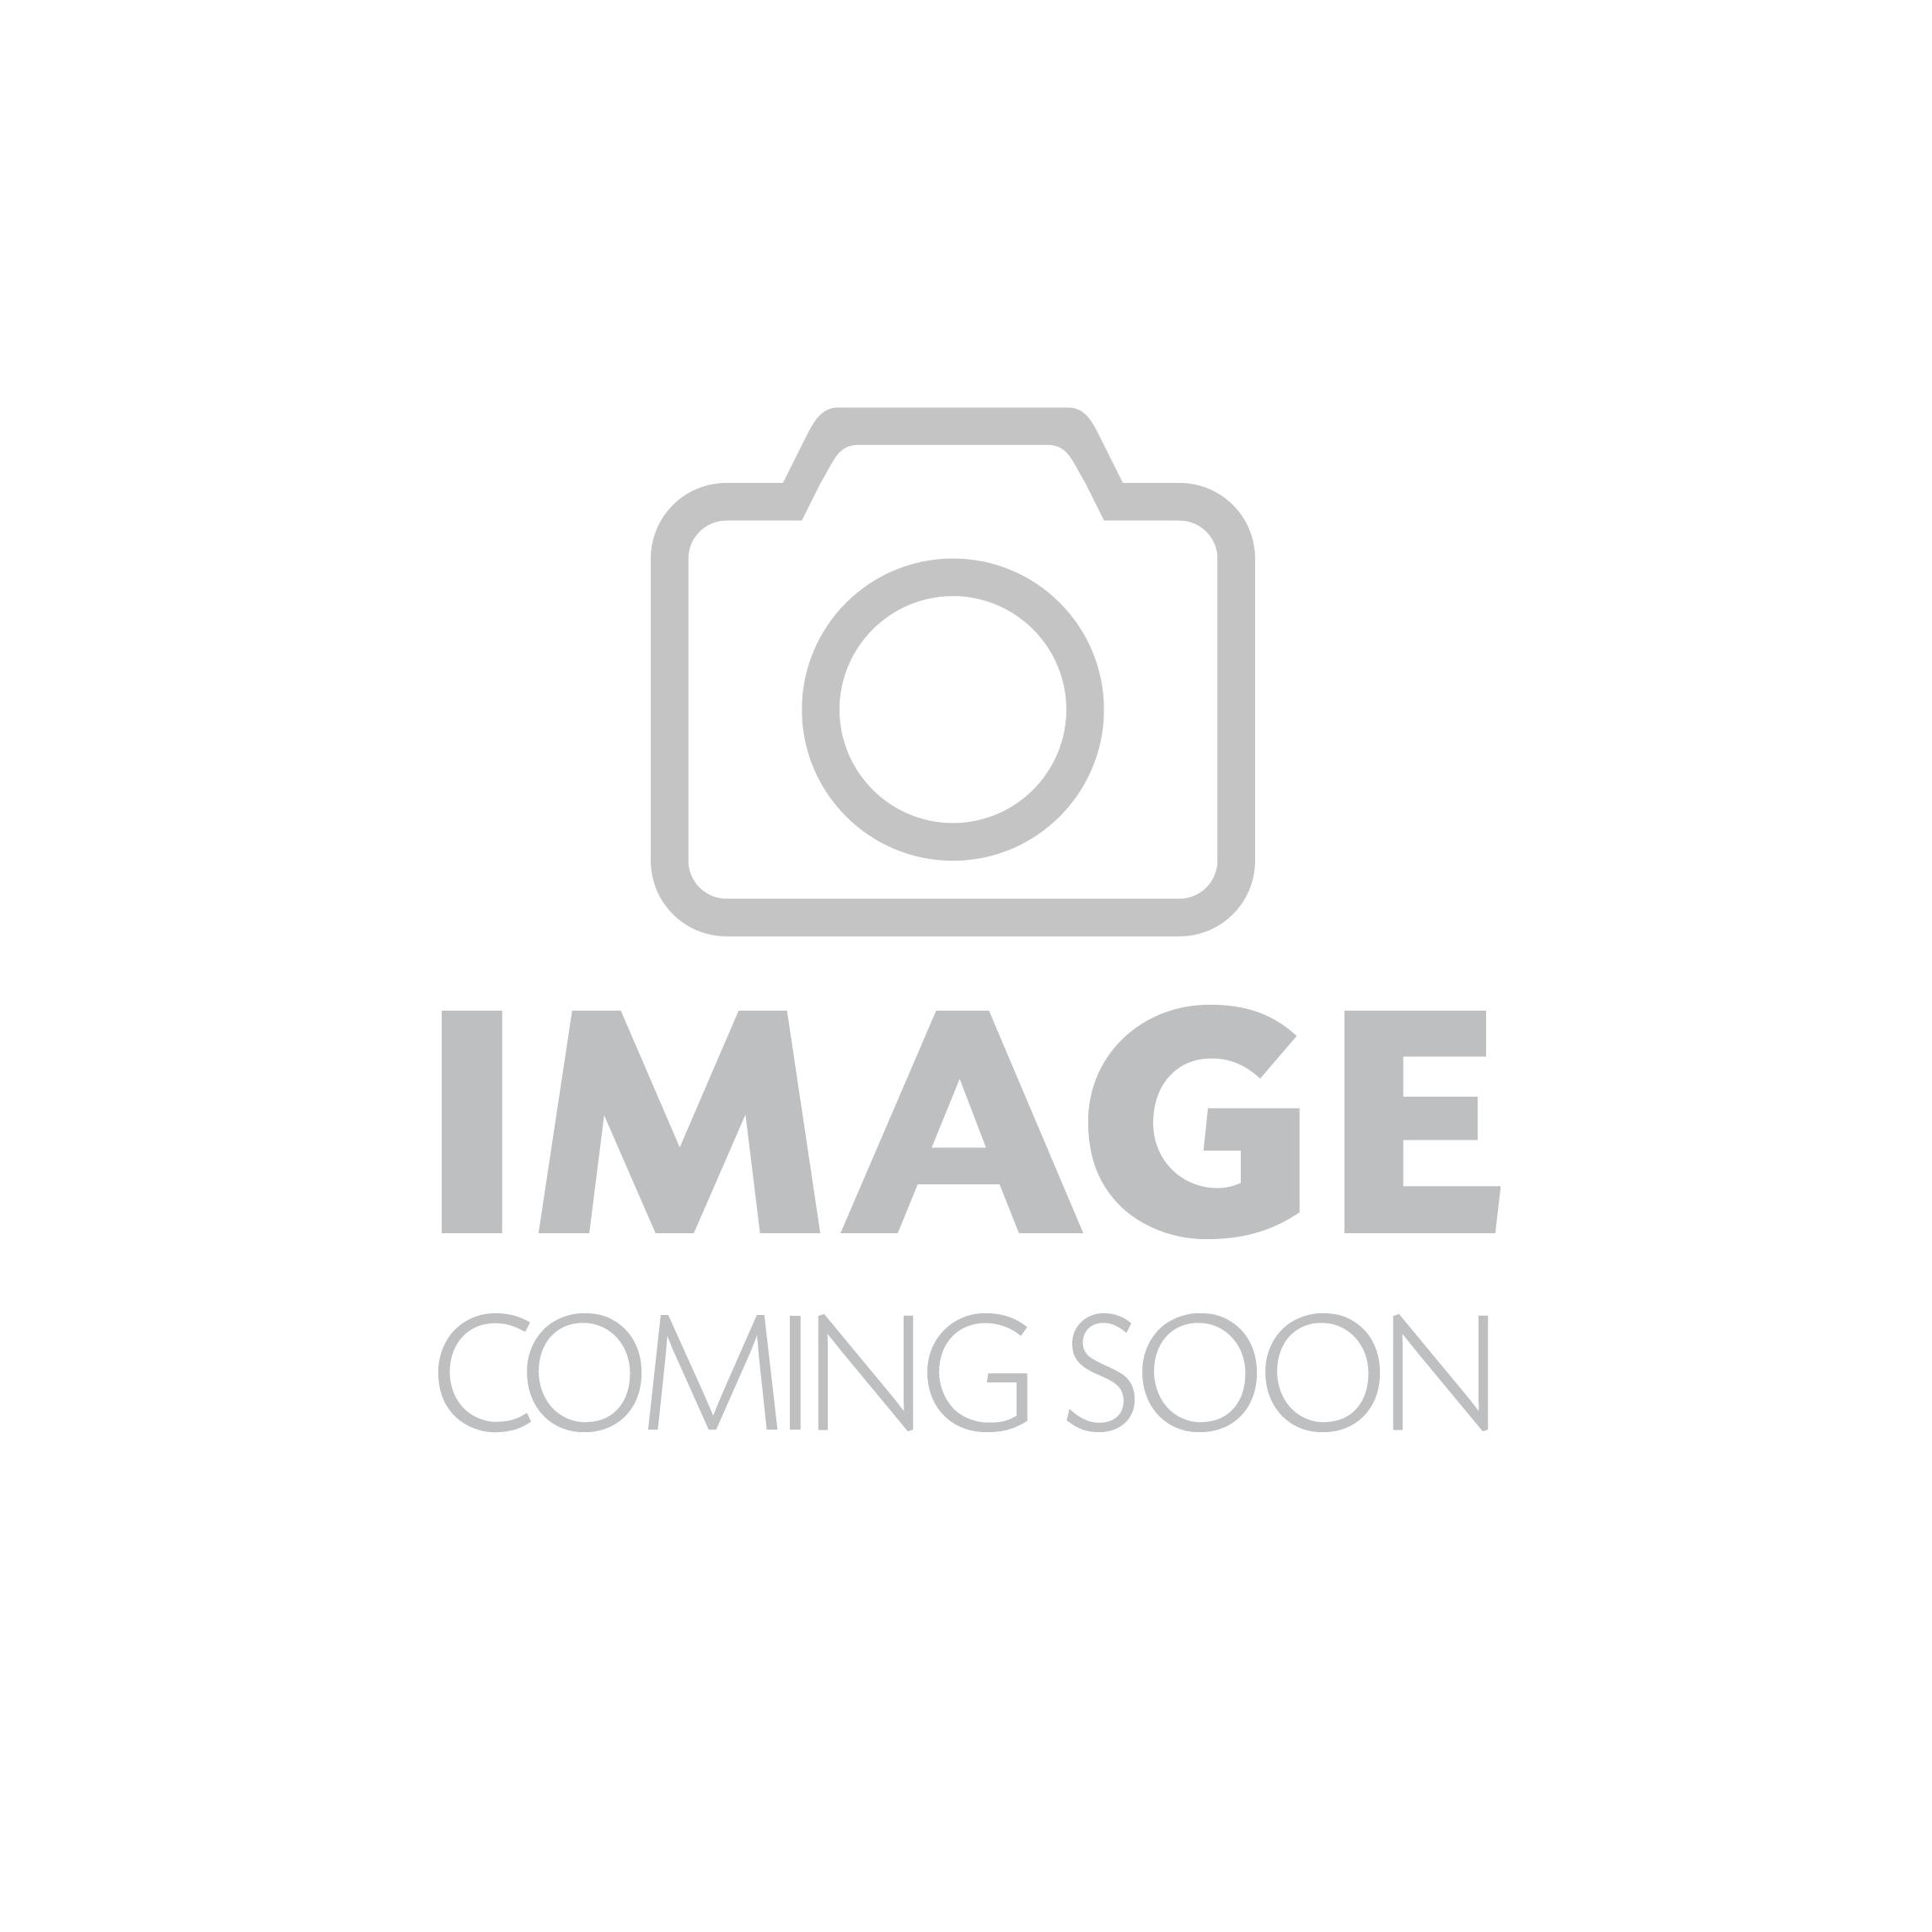 Croydex Universal Flush Valve Butt Cable